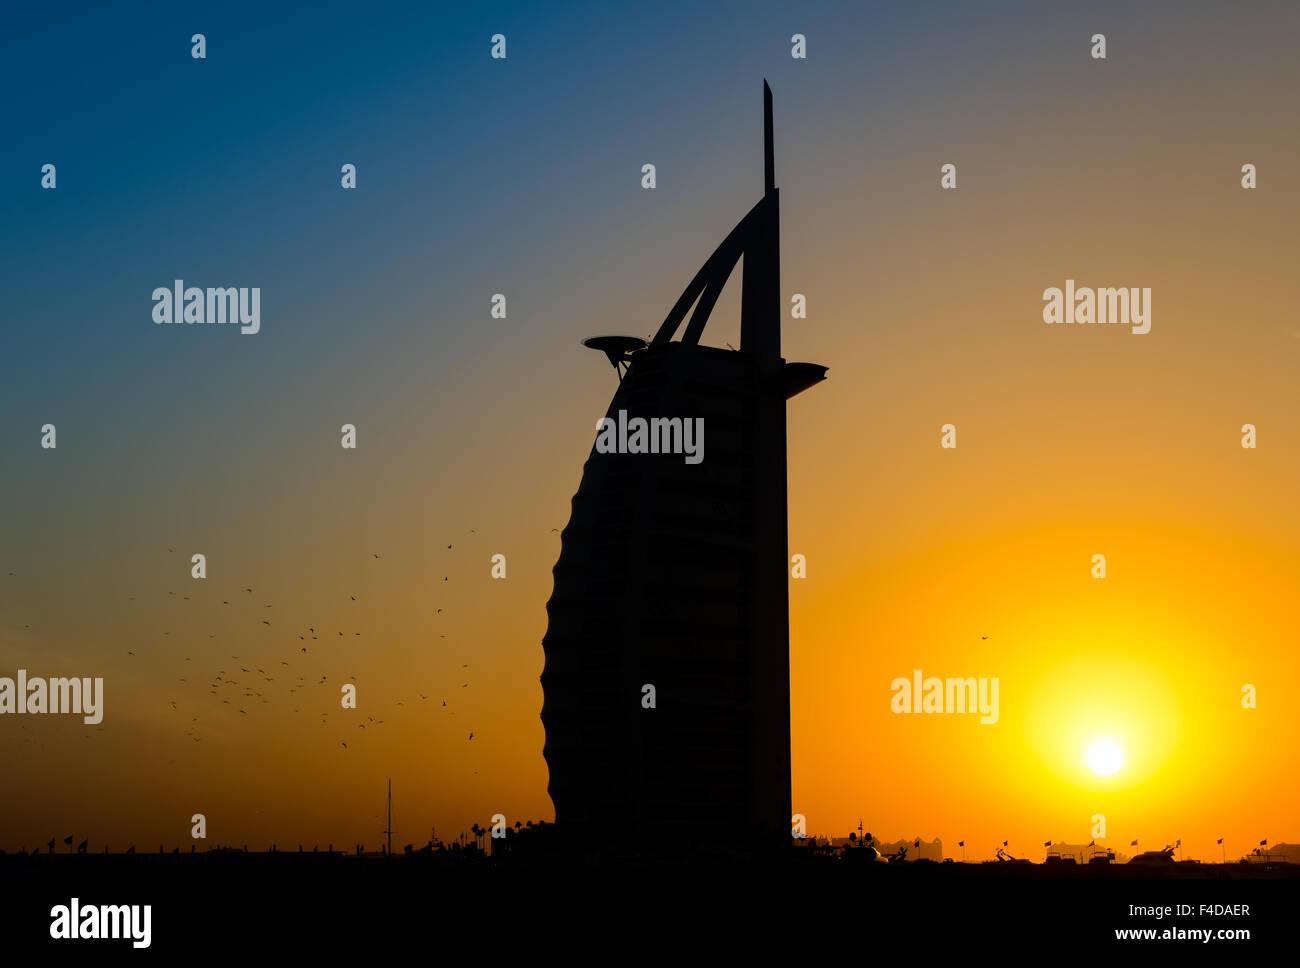 Silhouette of Hotel Burj Al Arab, Dubai, in sunset - Stock Image